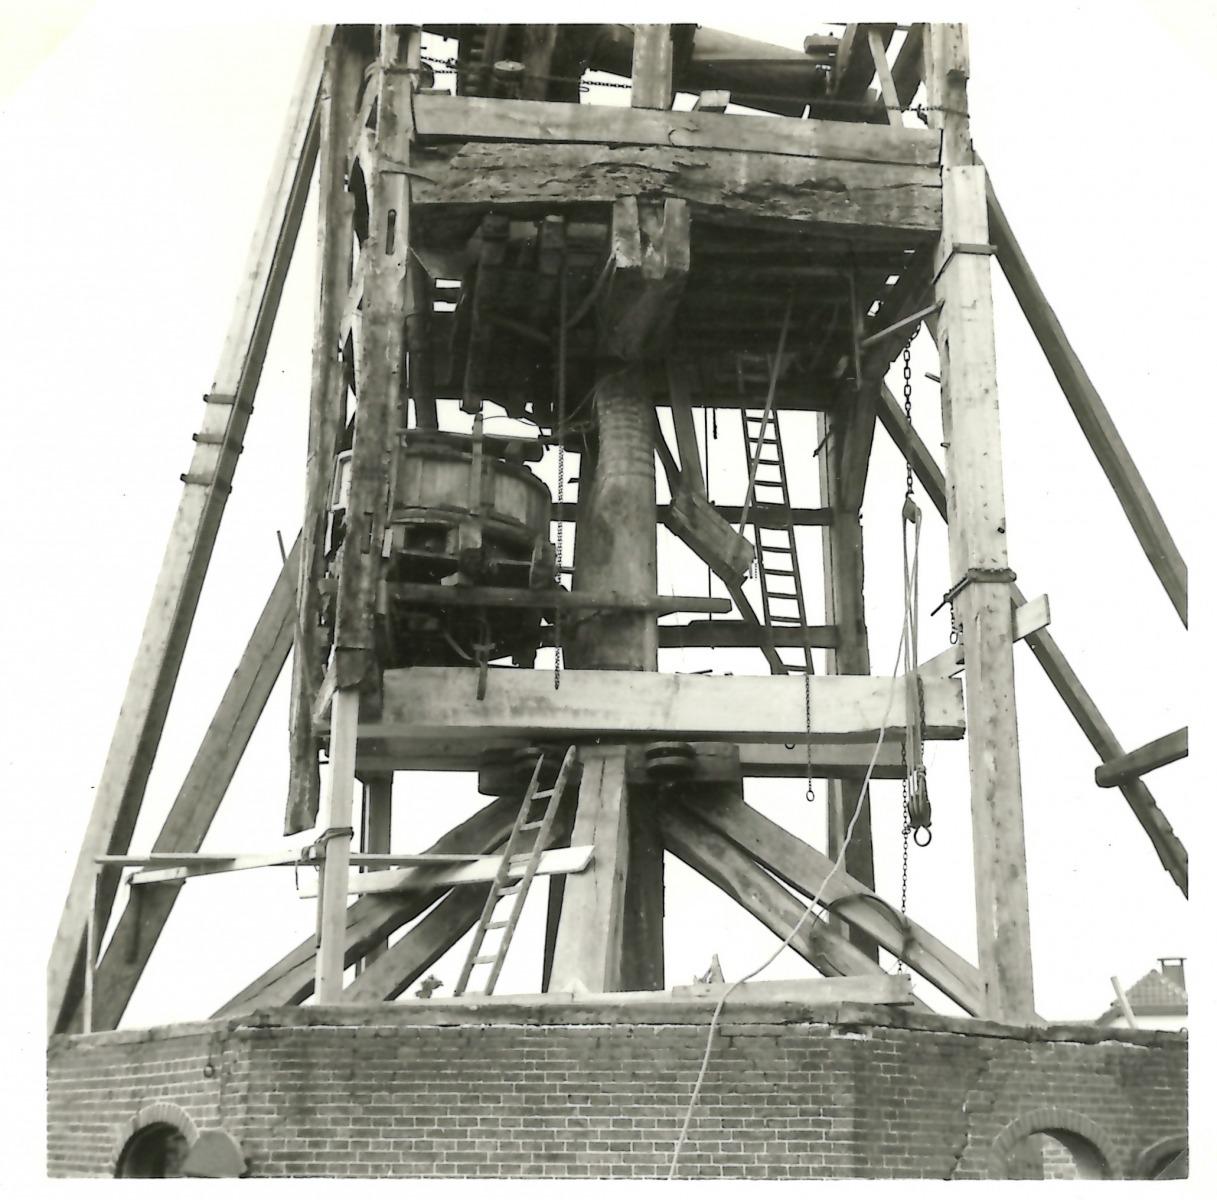 0002-07-08-1964